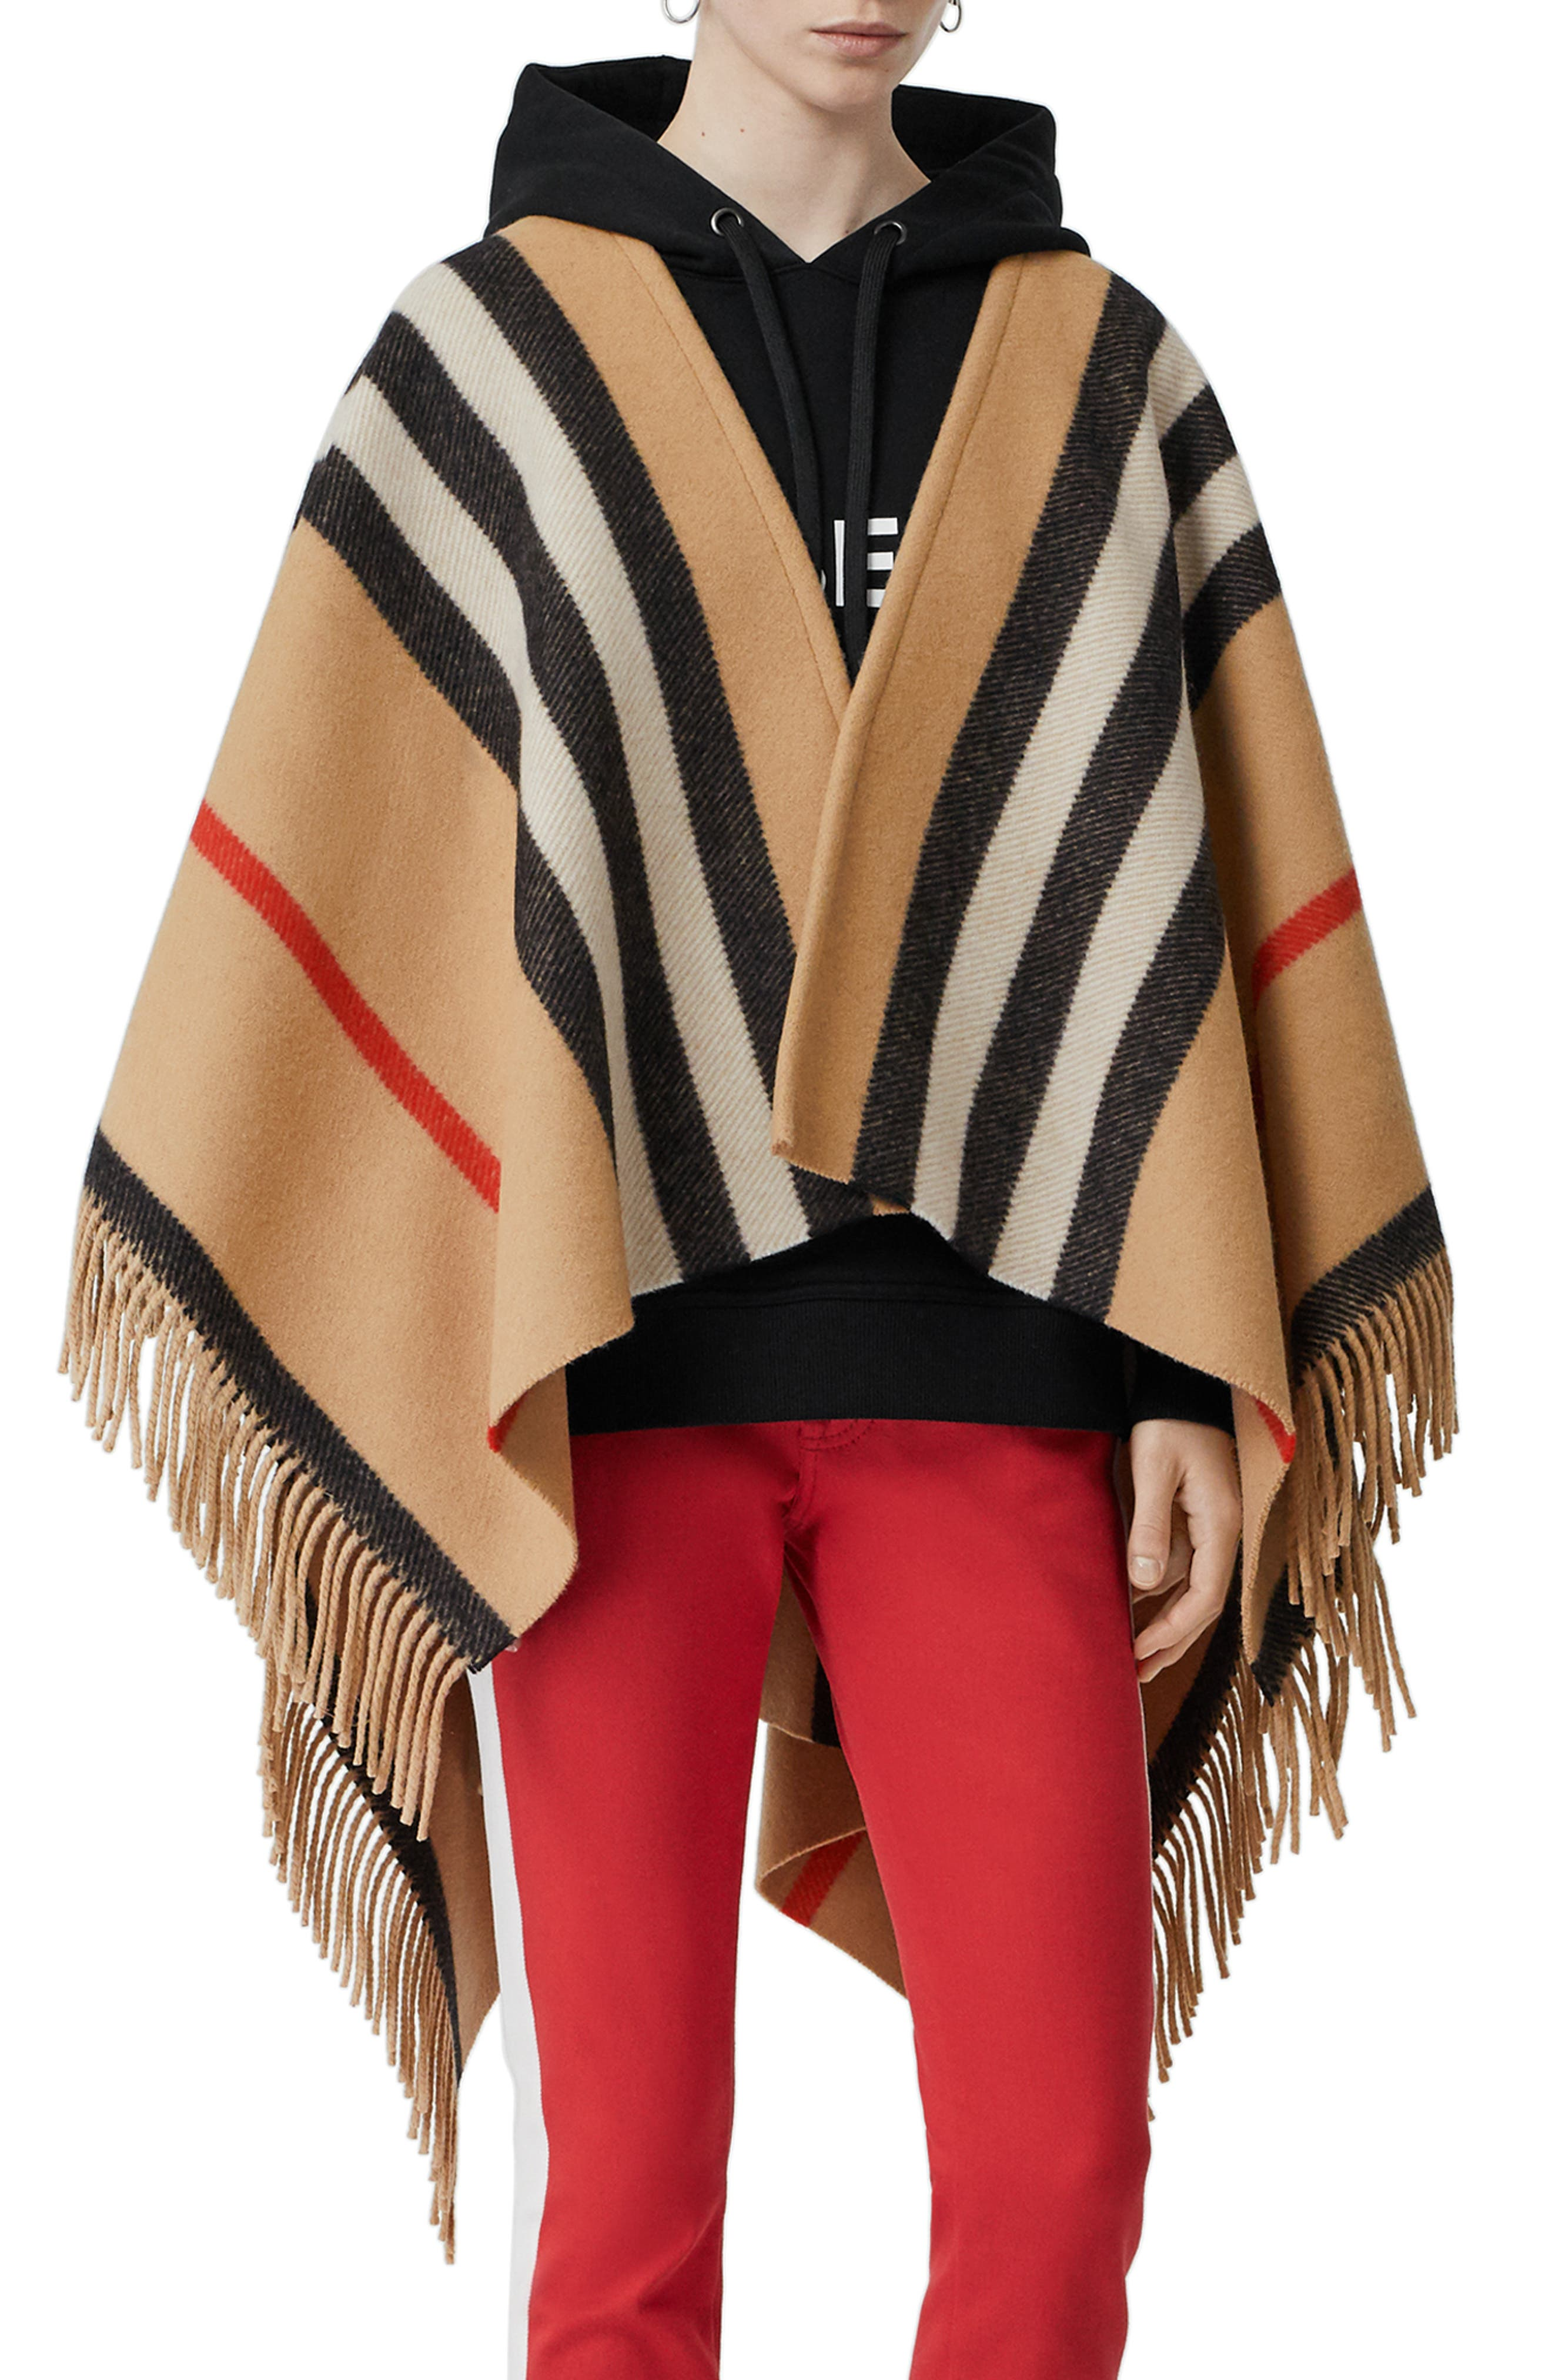 BURBERRY, Stripe Fringe Wool Cape, Main thumbnail 1, color, CAMEL